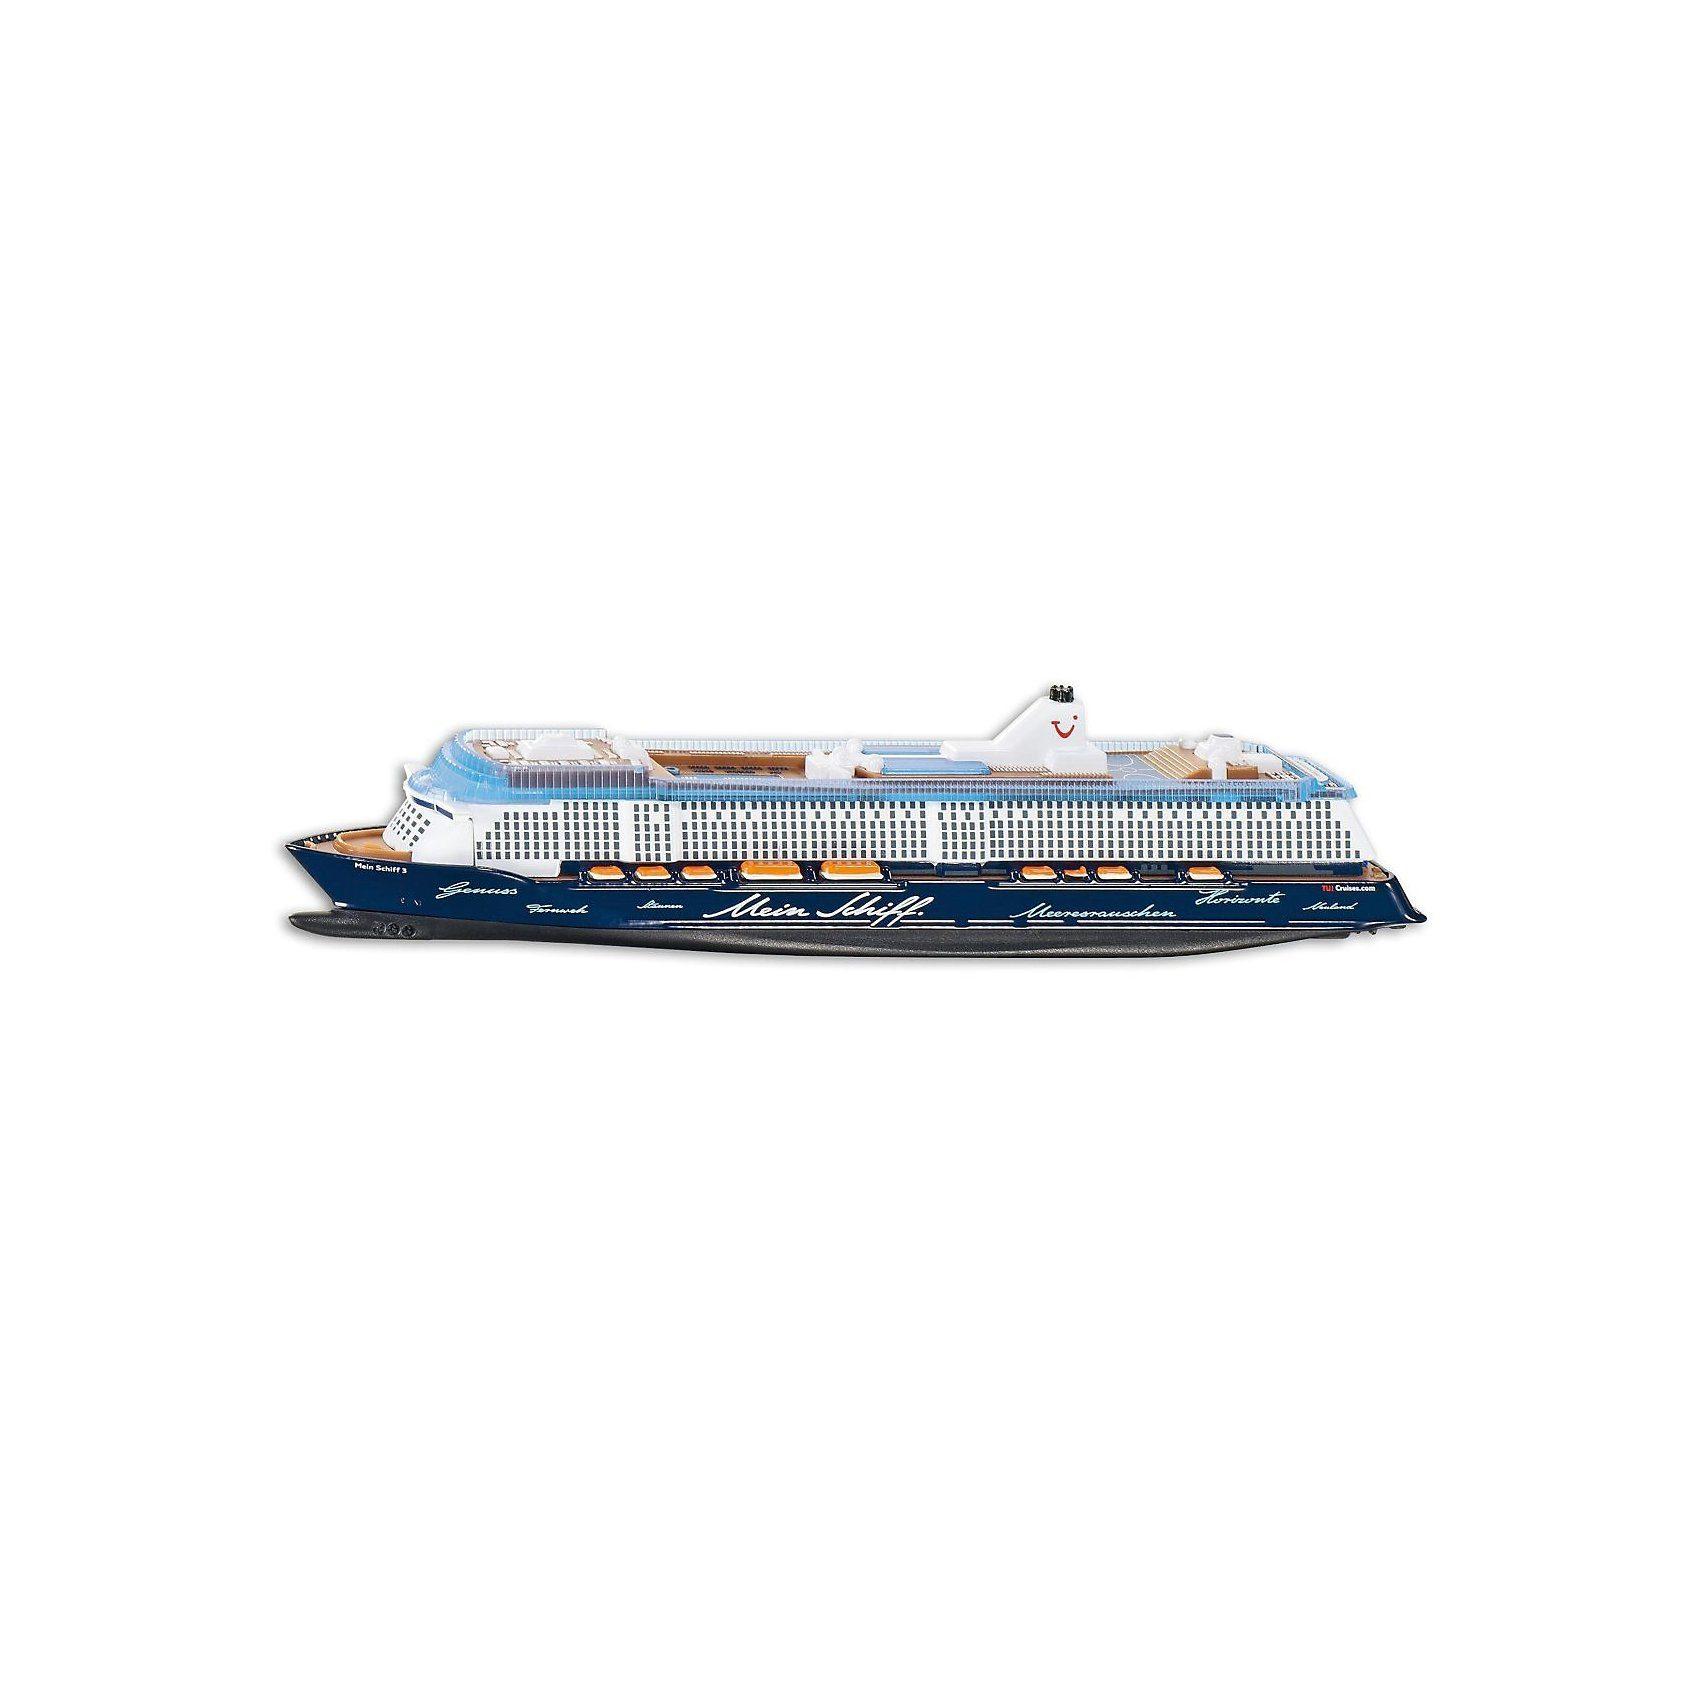 Siku Super 1724 Mein Schiff 3 1:1400